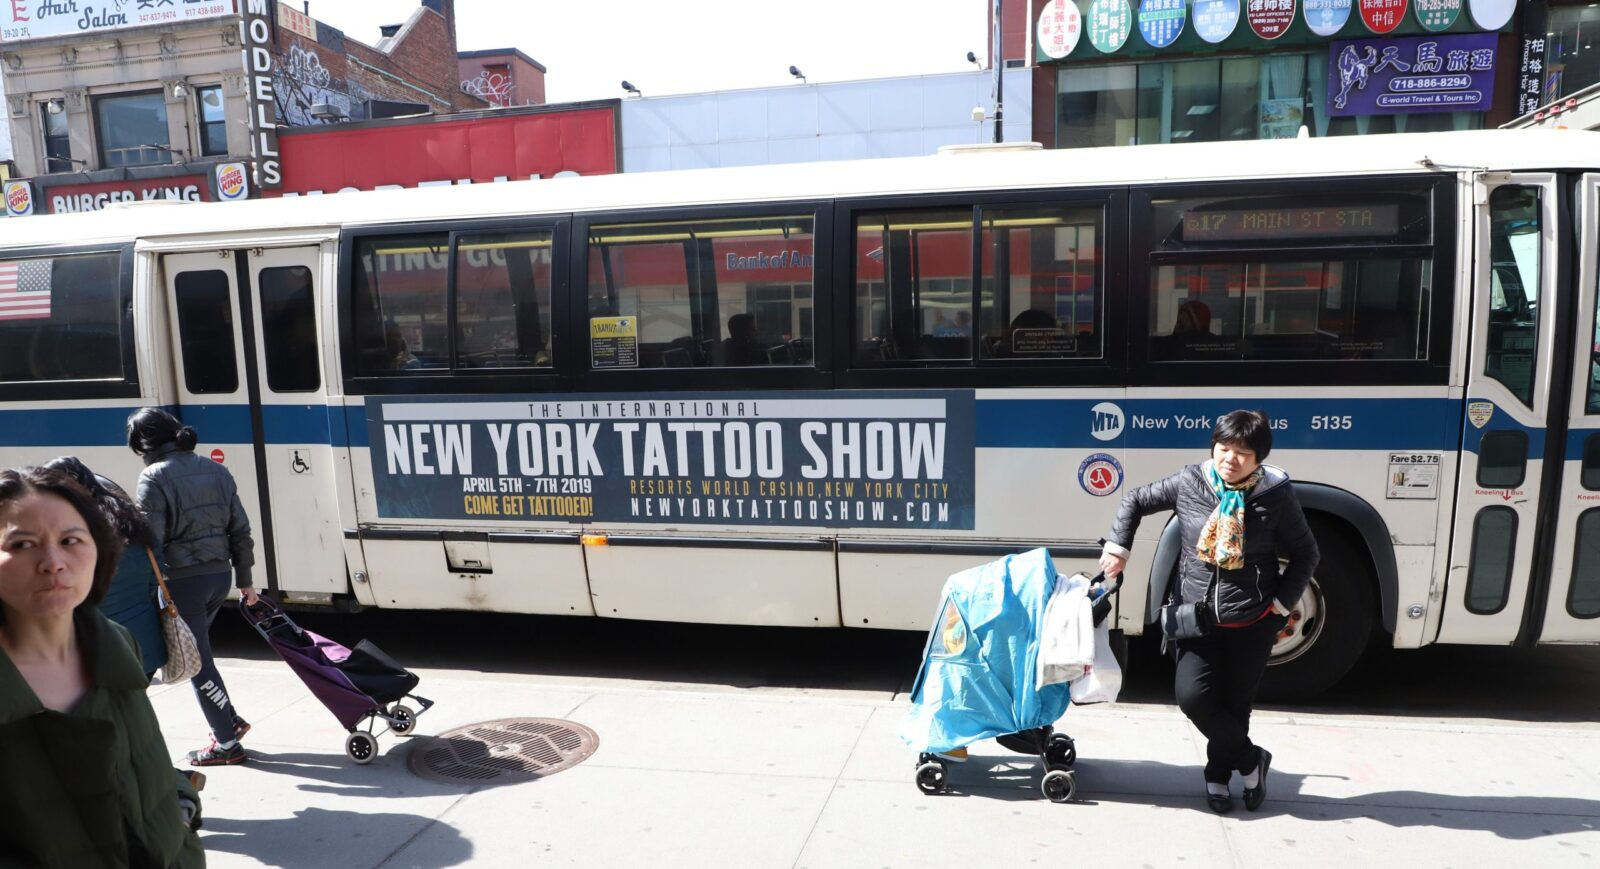 United Ink Bus King Advertising